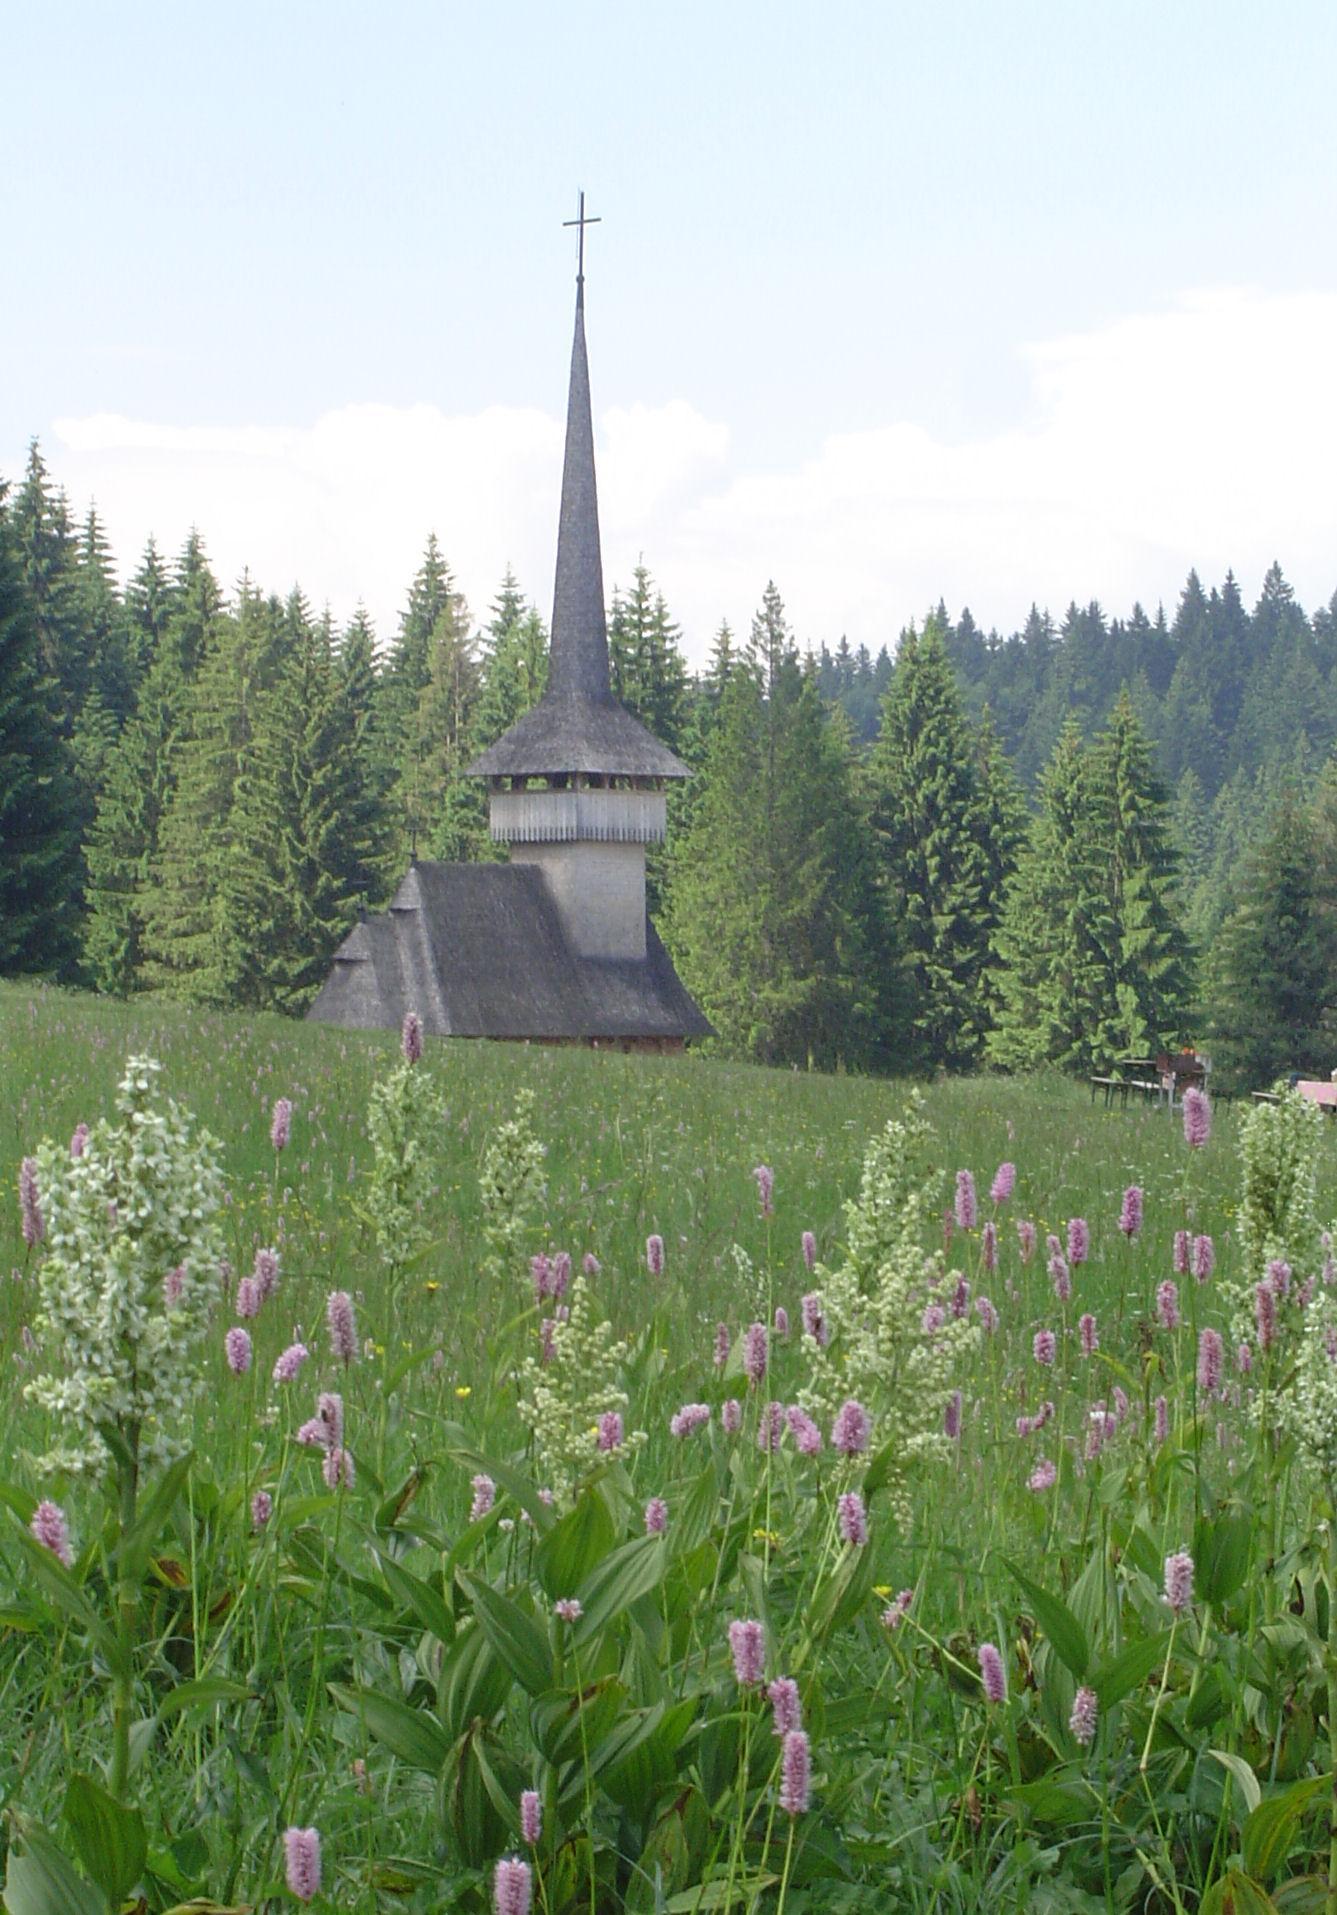 Poiana church